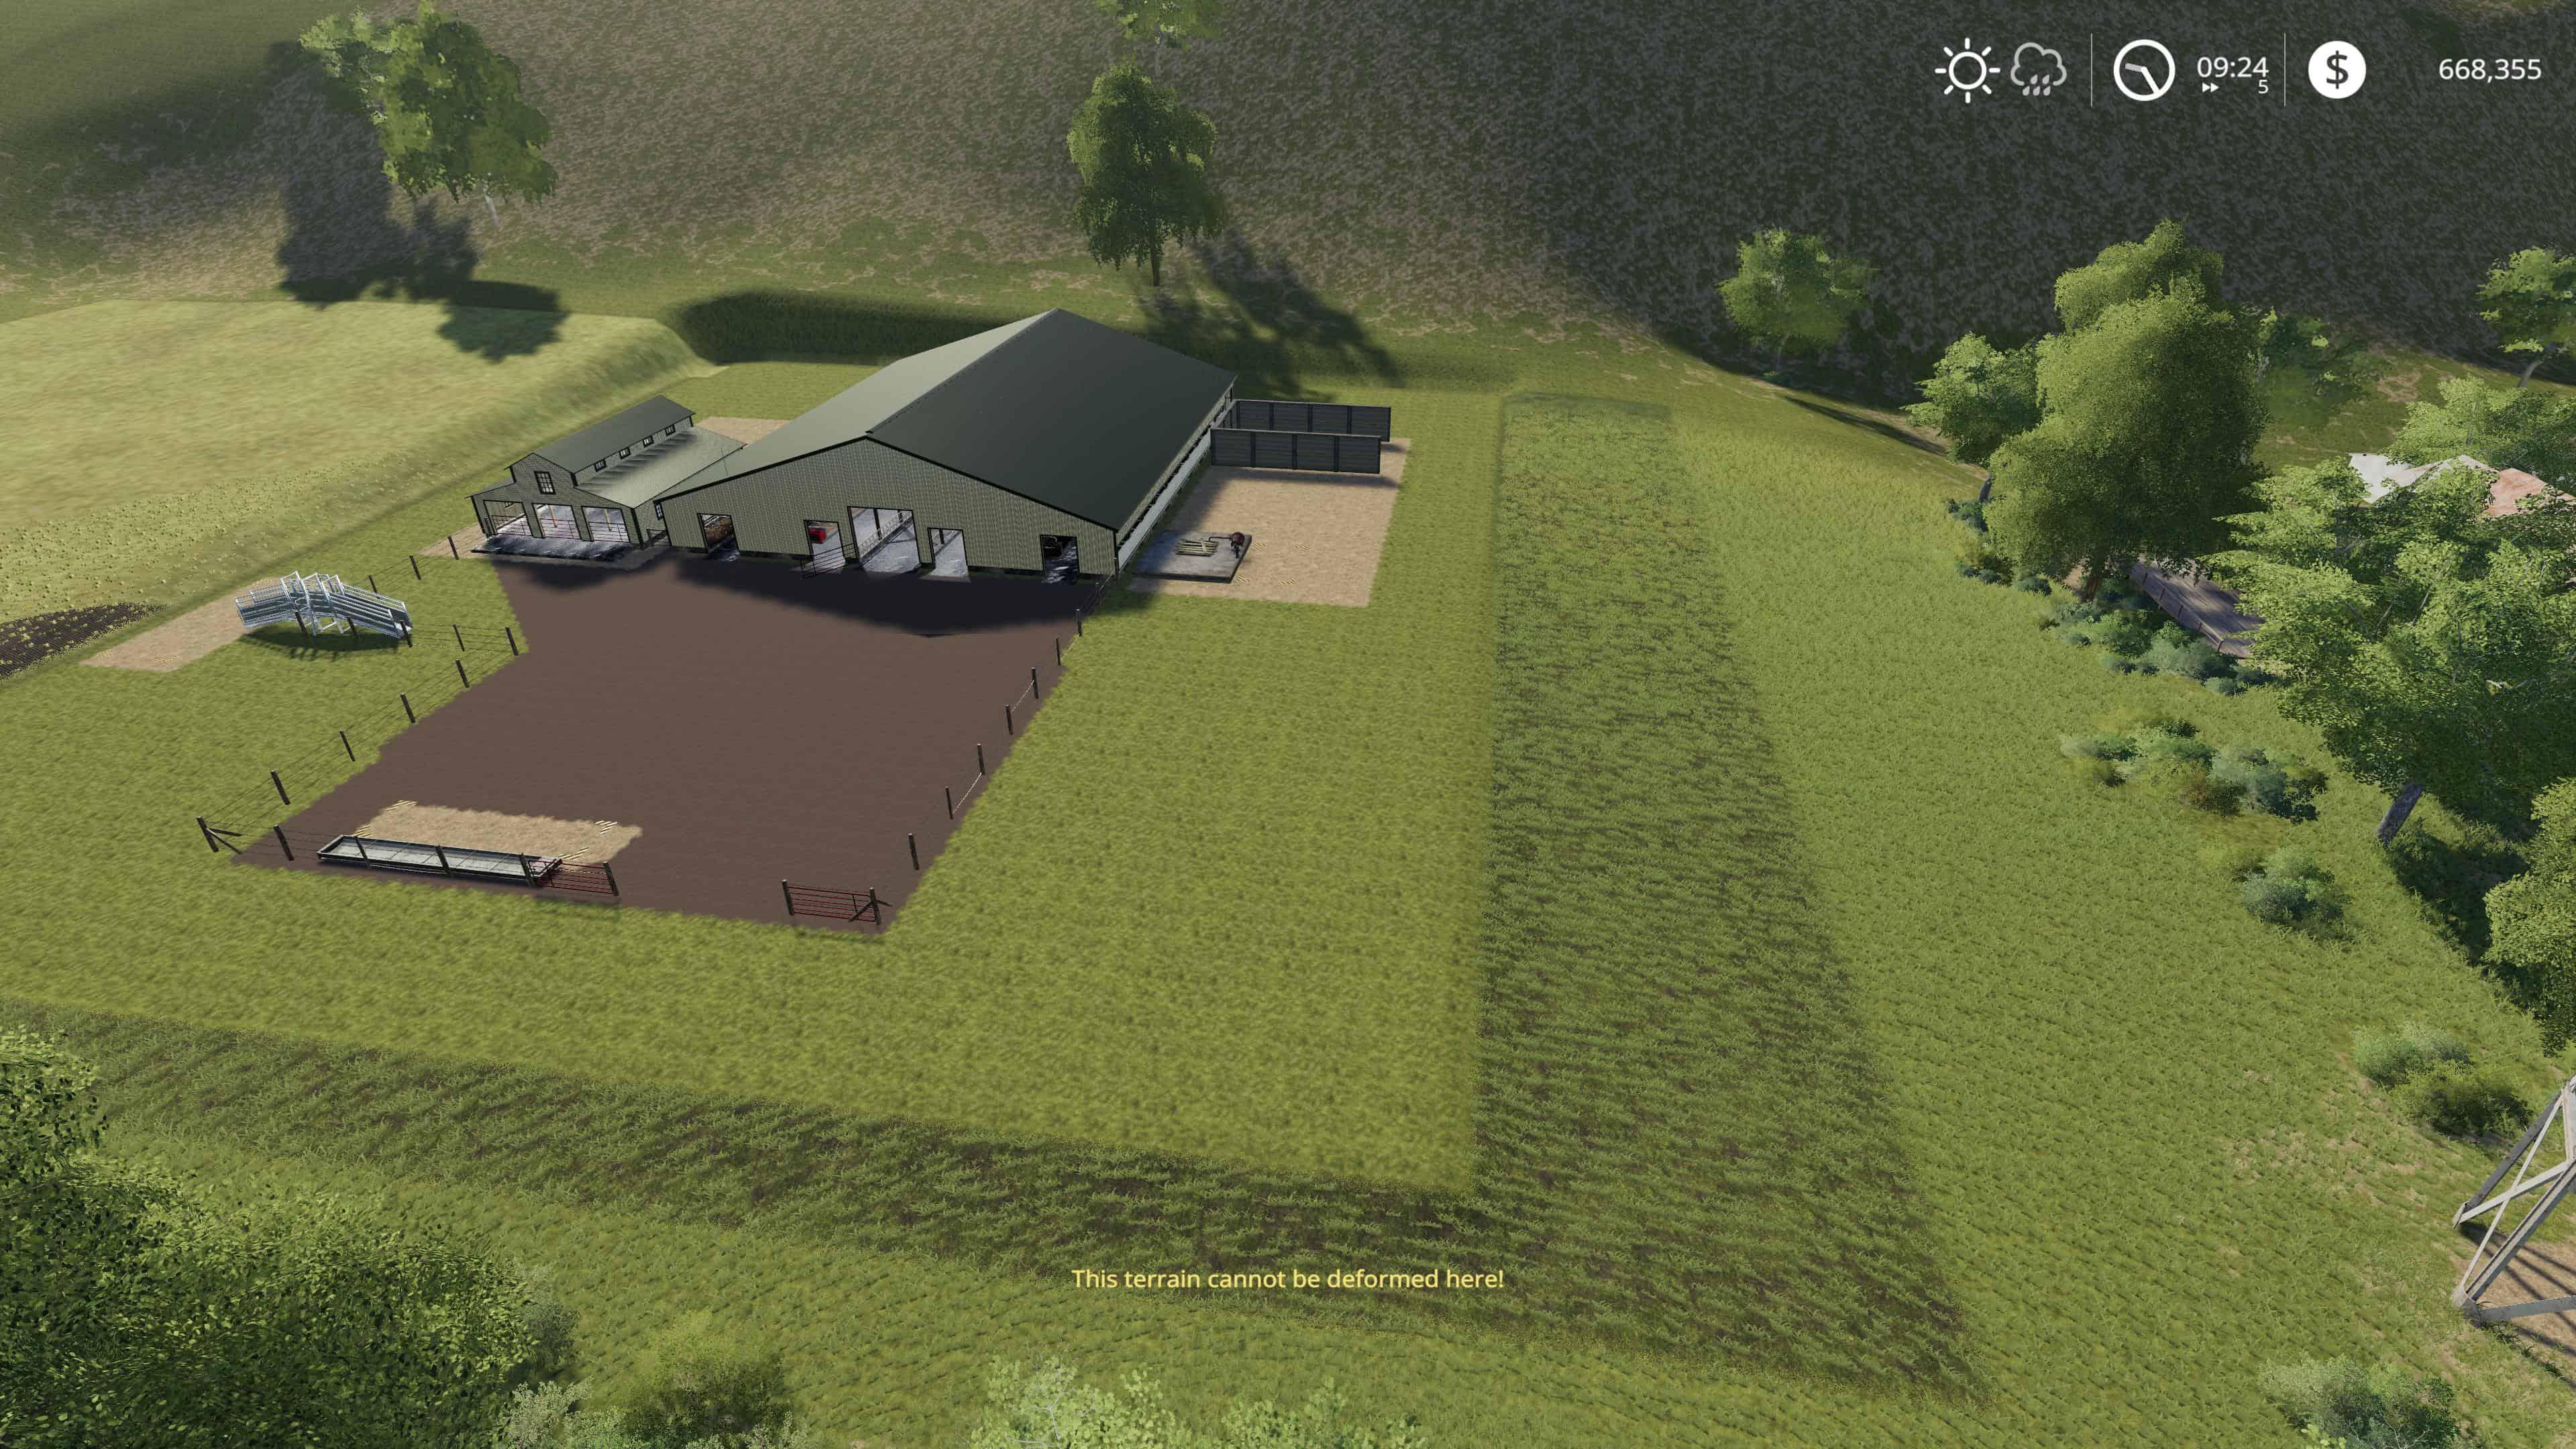 Large American Cow Shed v1 0 Mod - Farming Simulator 19 Mod